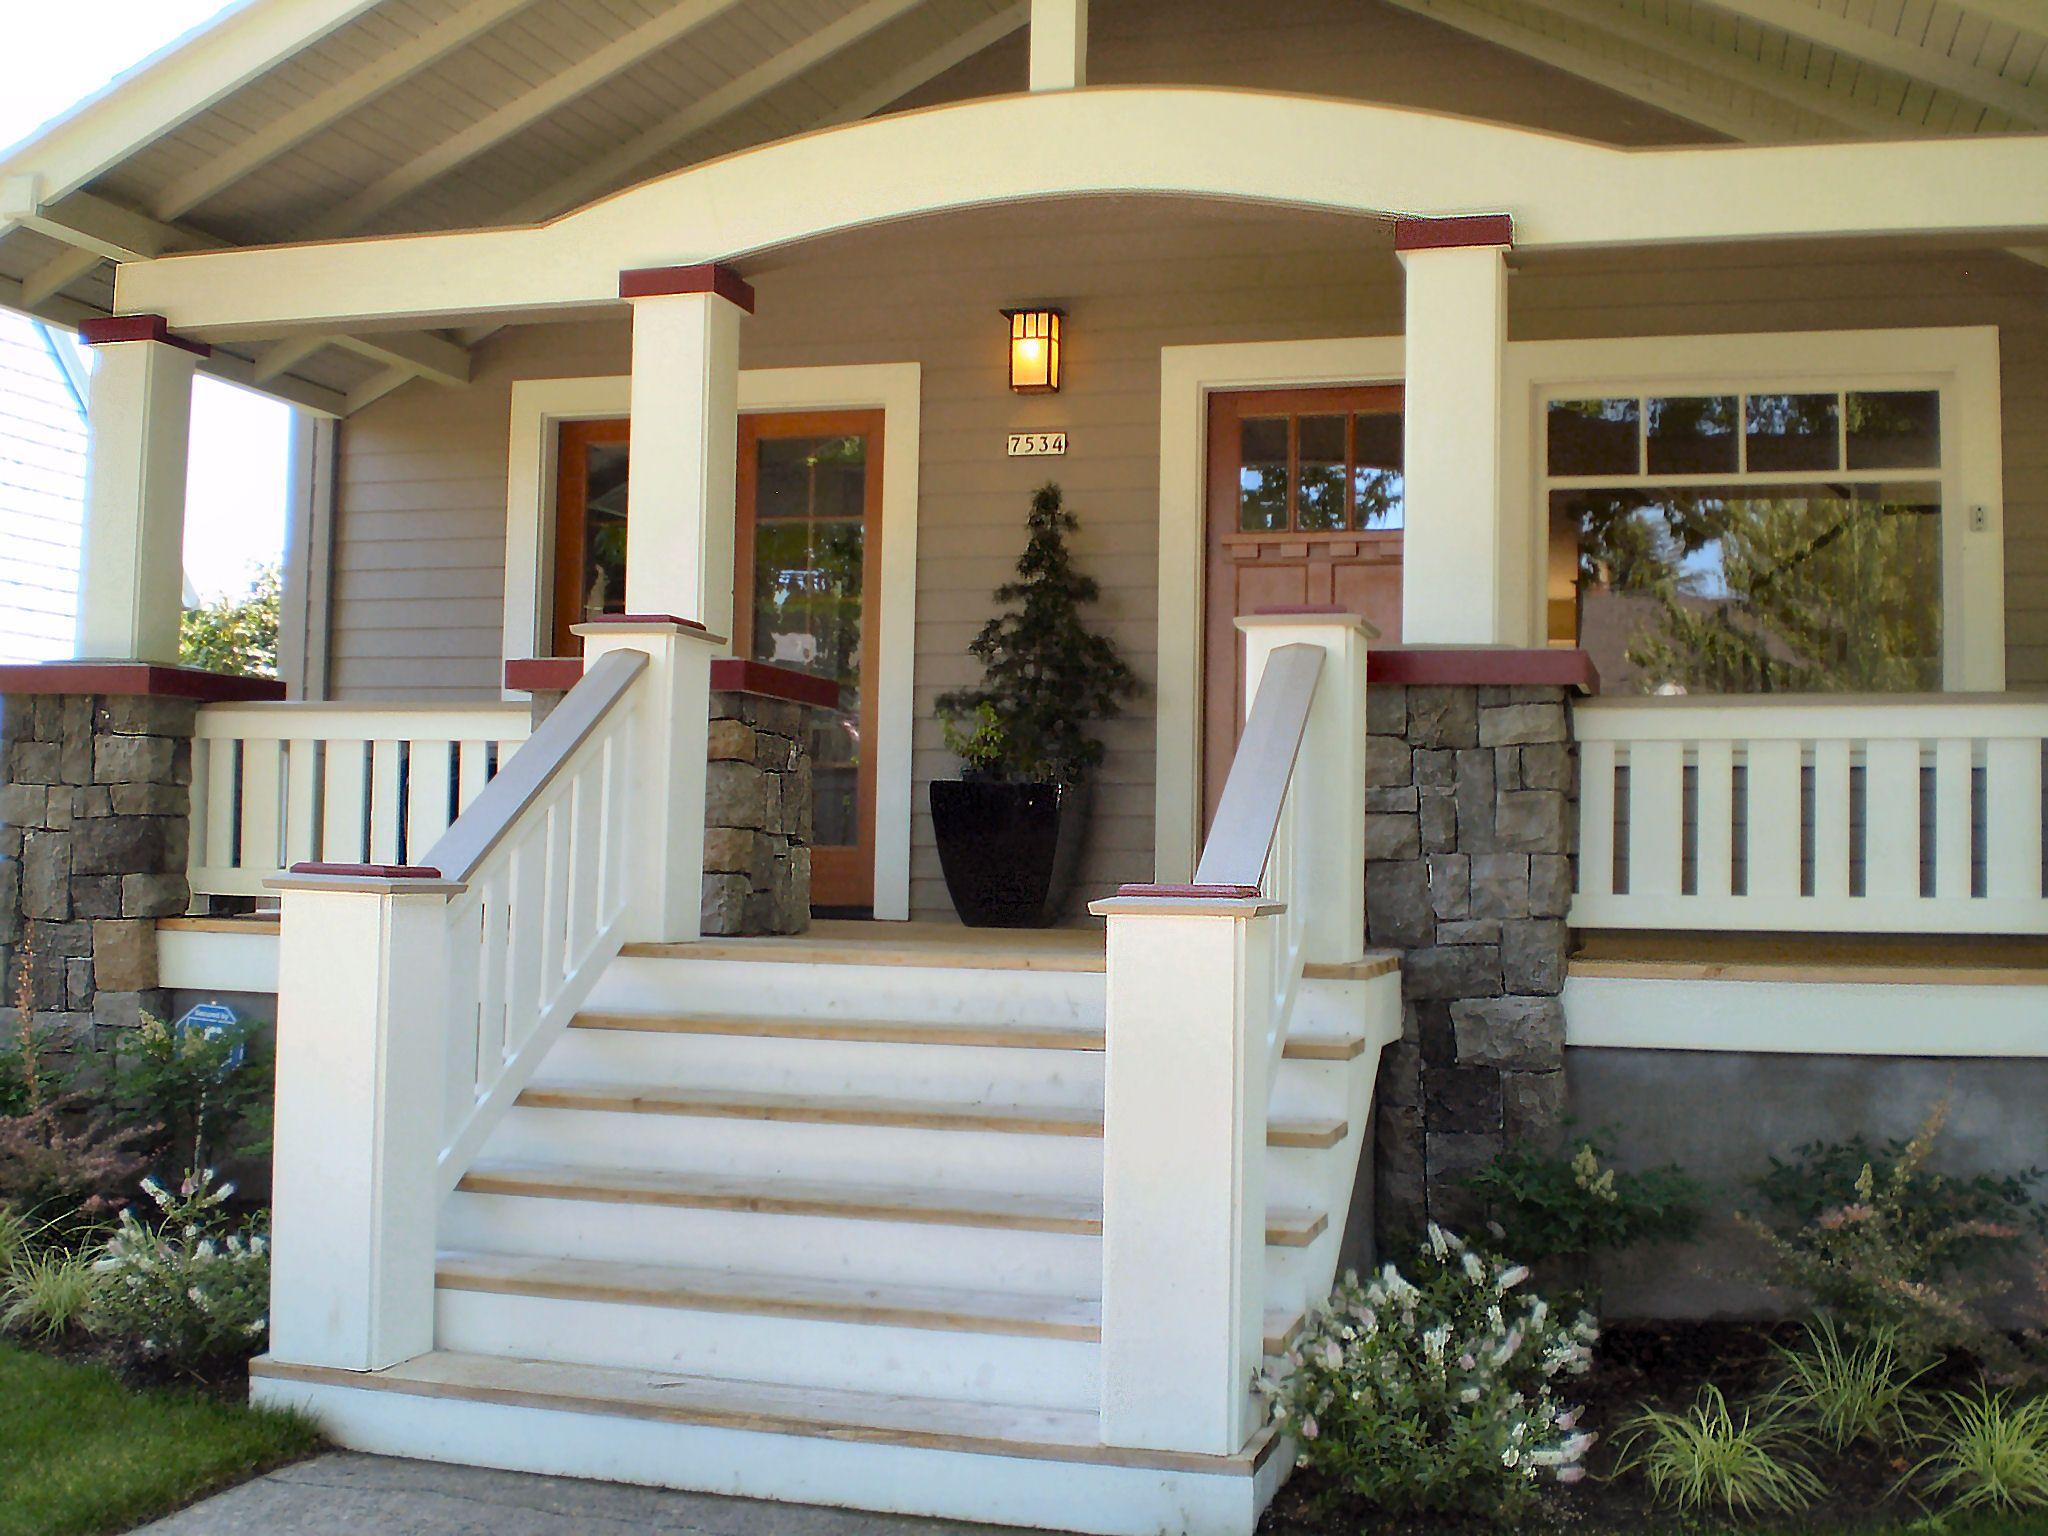 Best Wood Porch Railings And Columns Craftsman Porch Porch 640 x 480